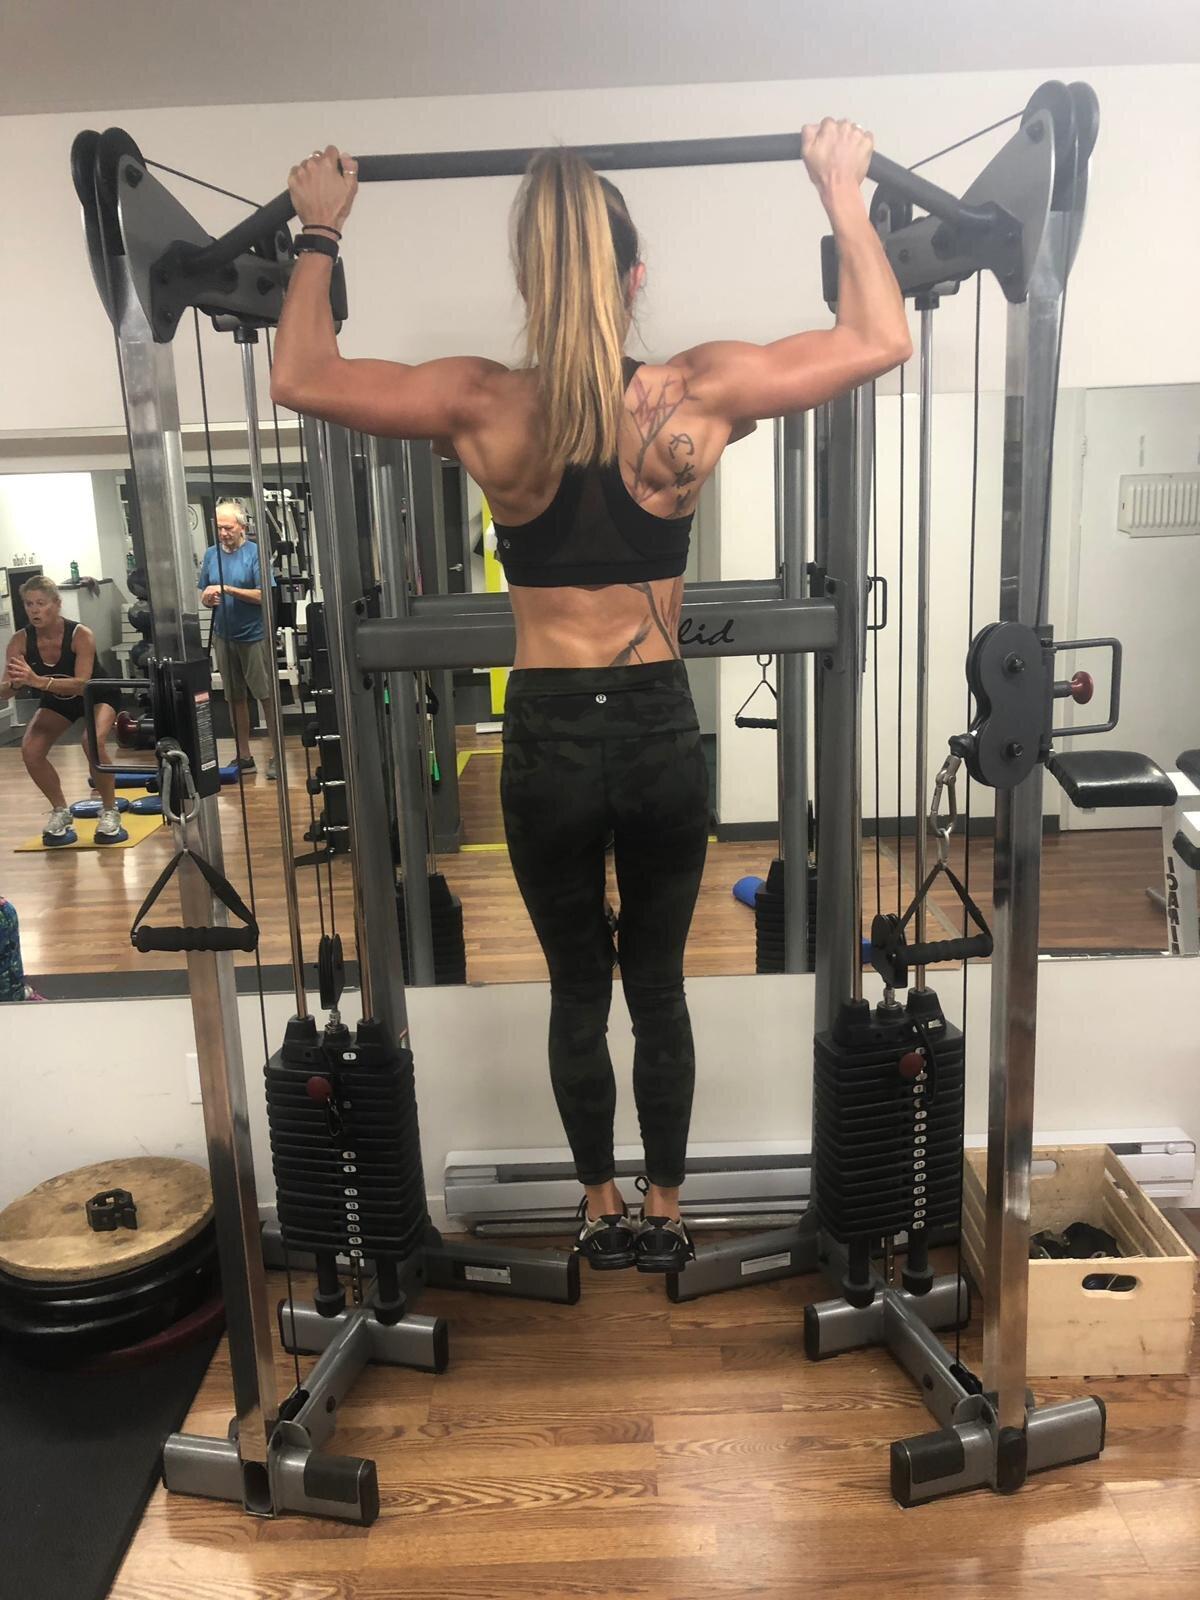 Michelle Elliott bodybuilding whistler creek athletic club